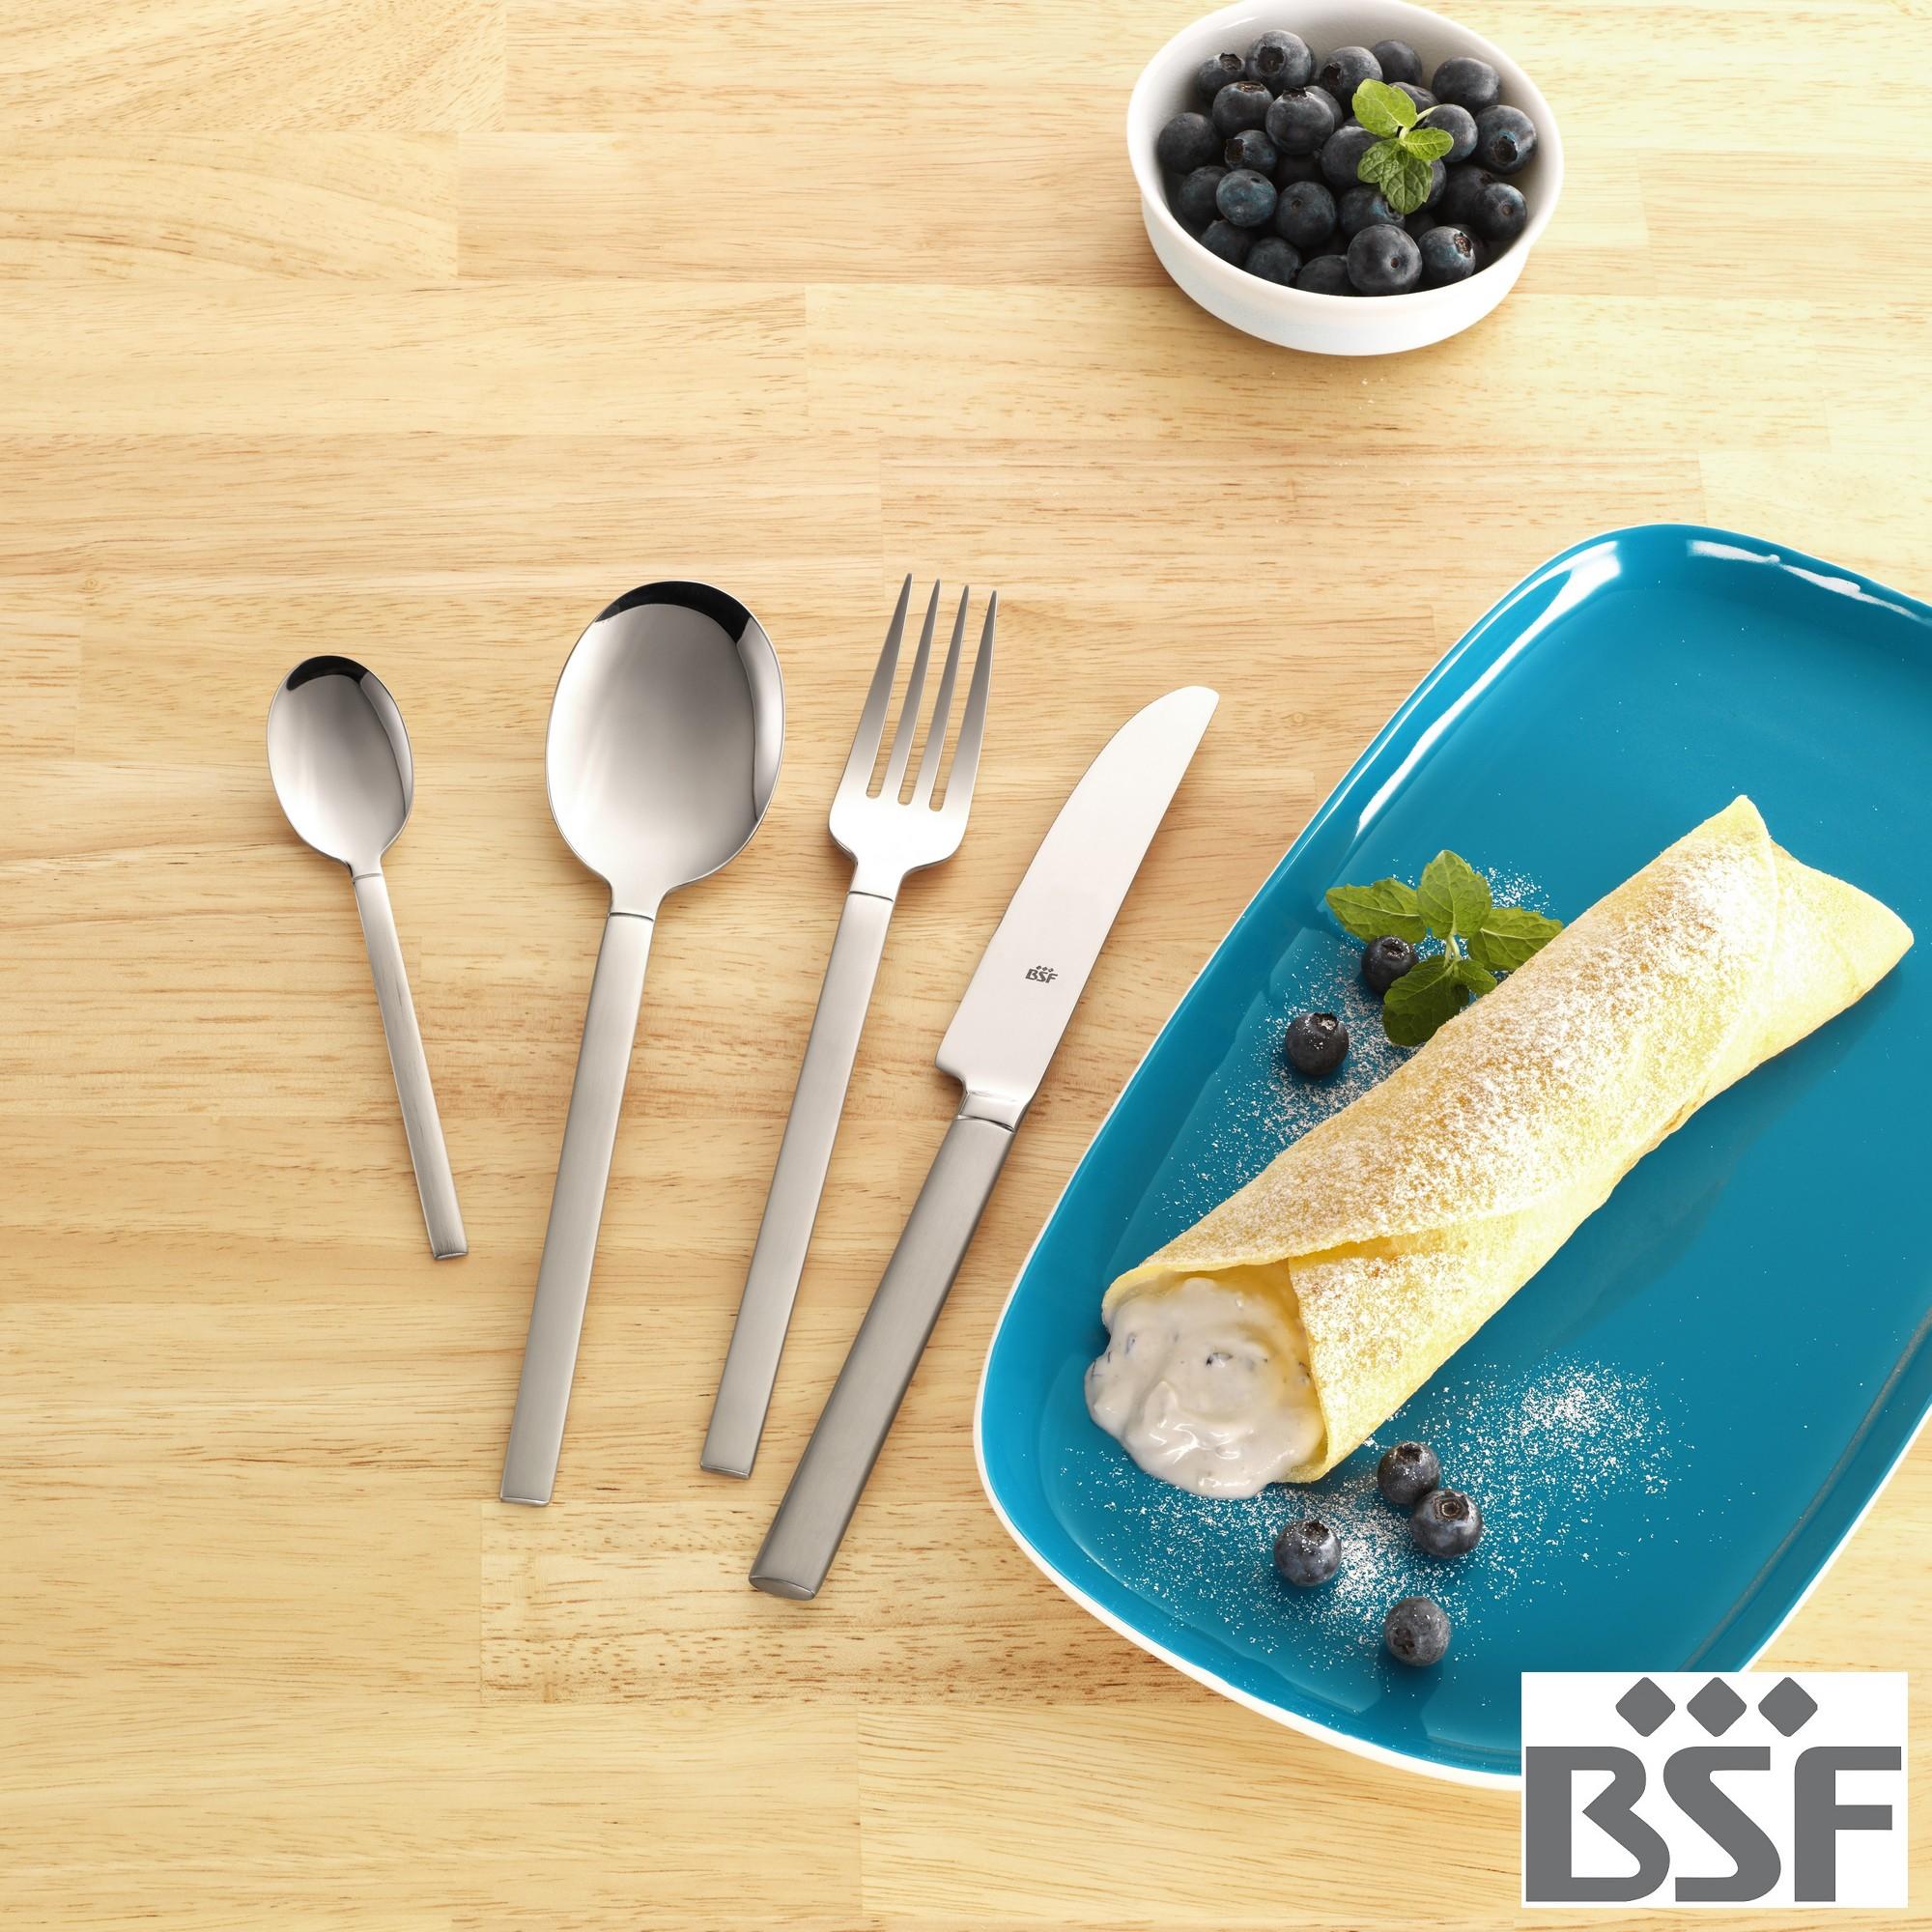 Colher de Sobremesa BSF Carrara Avulsa Caixa com 10 Peças